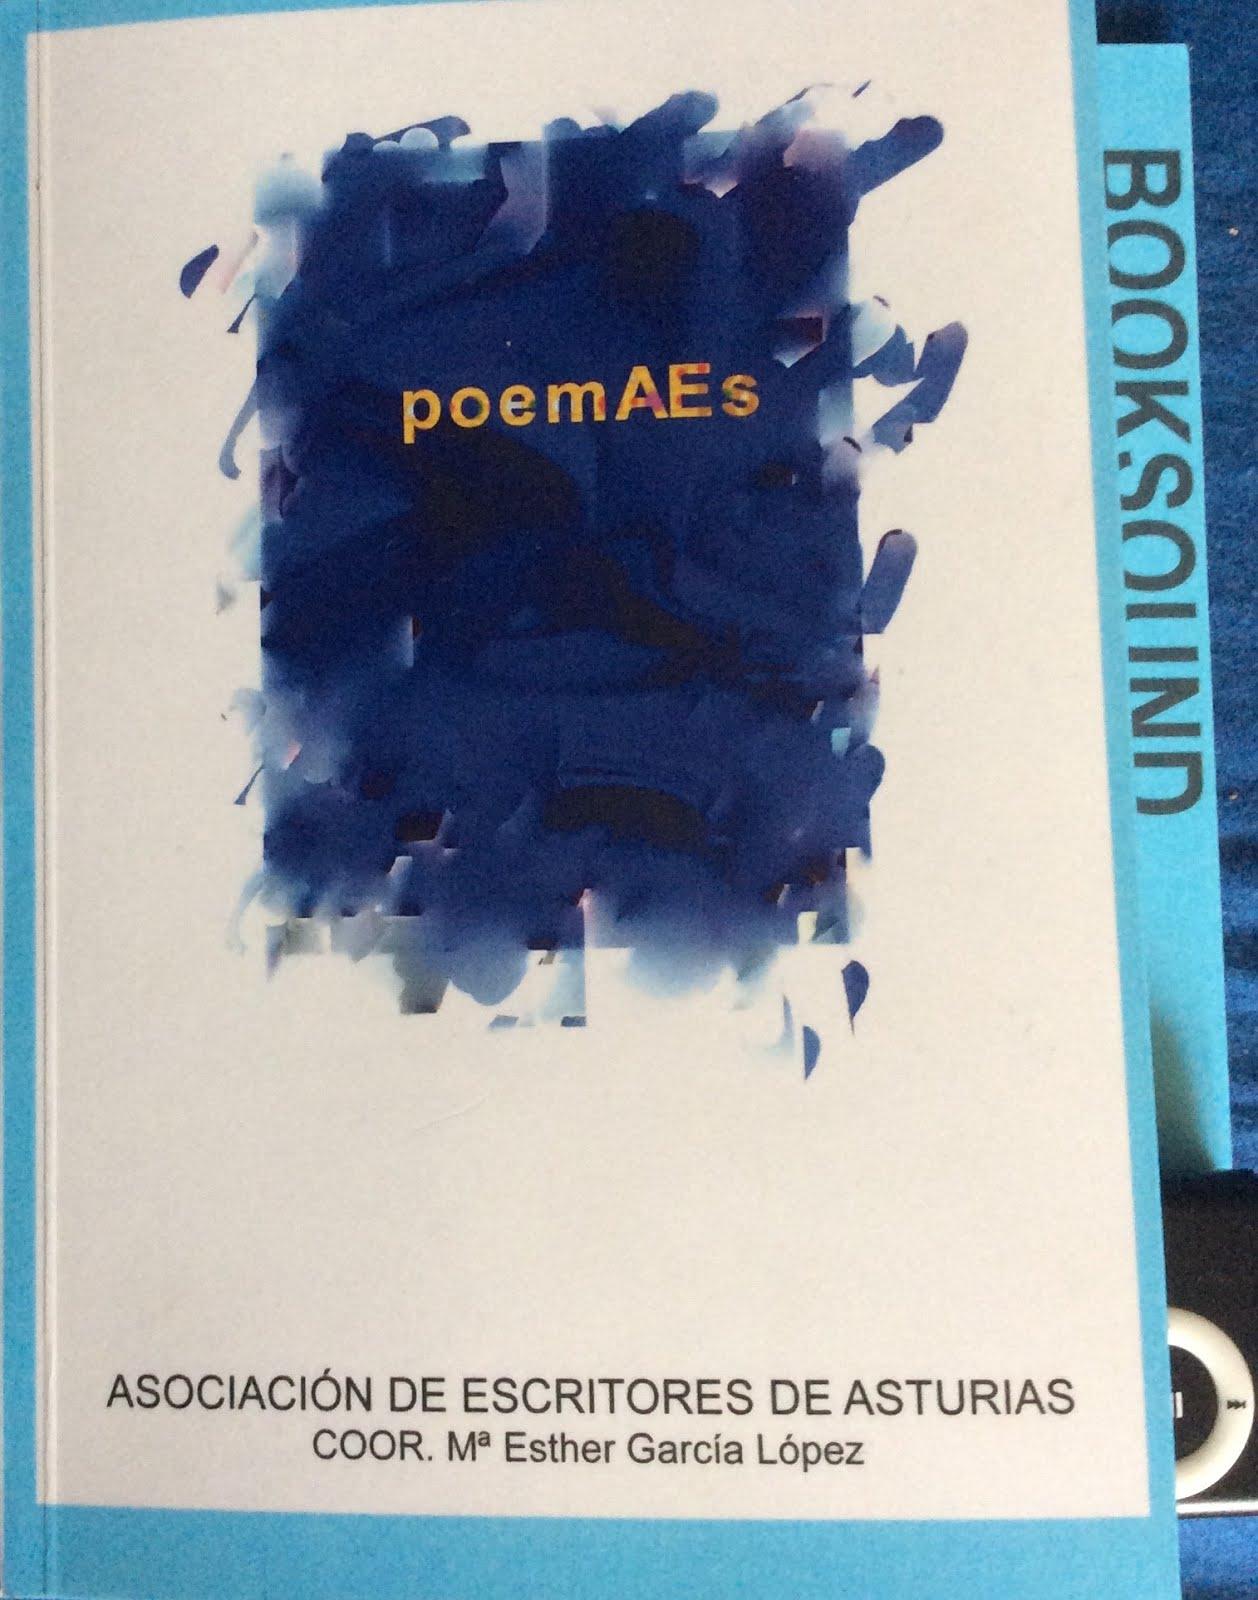 poemAEs